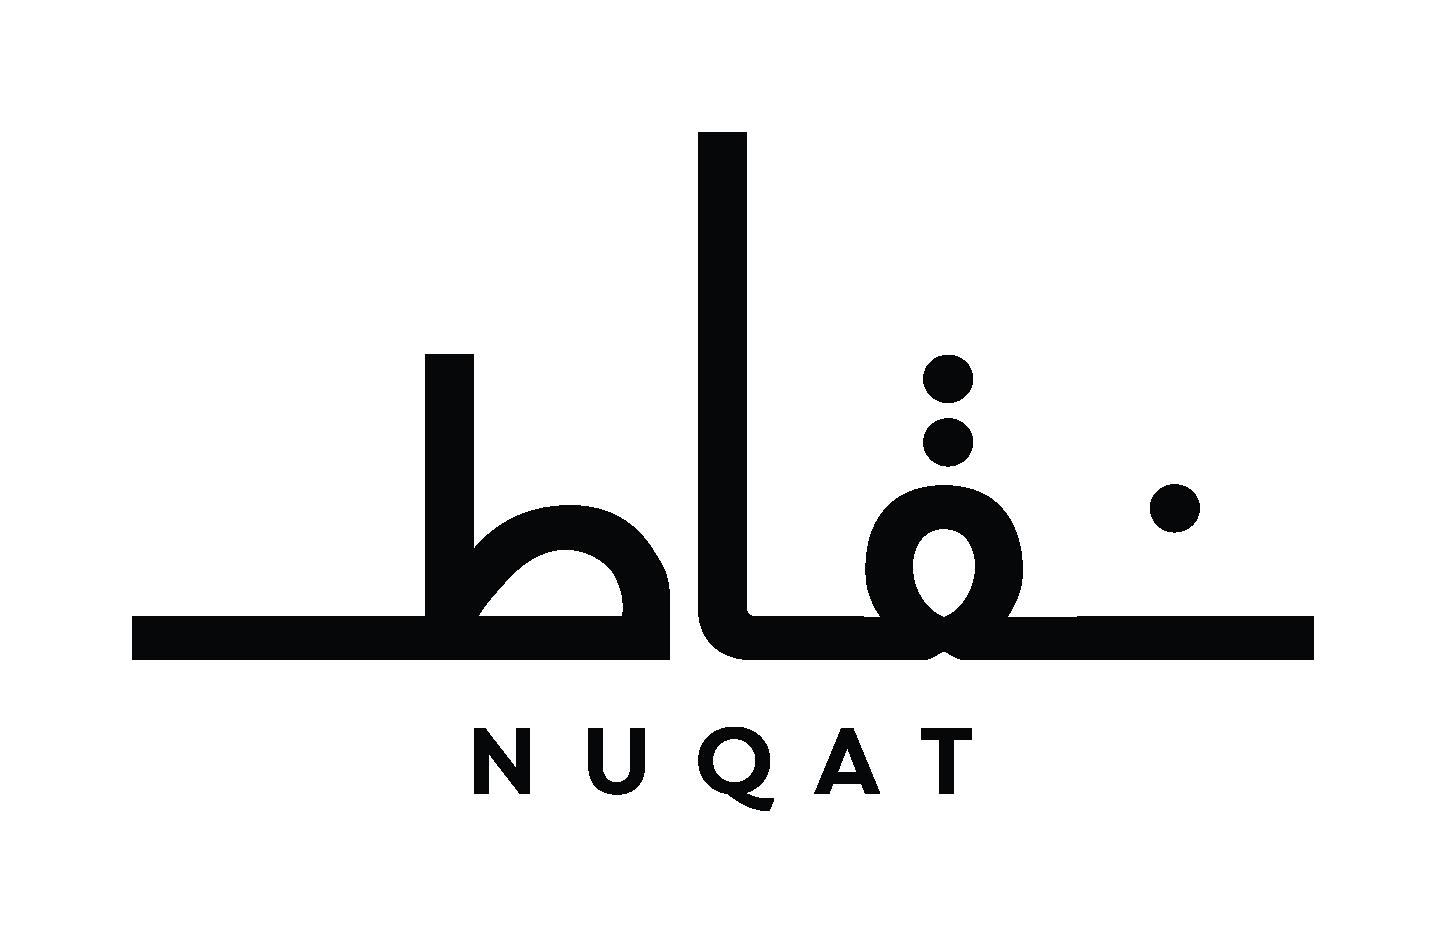 Nuqat_logo-01.png